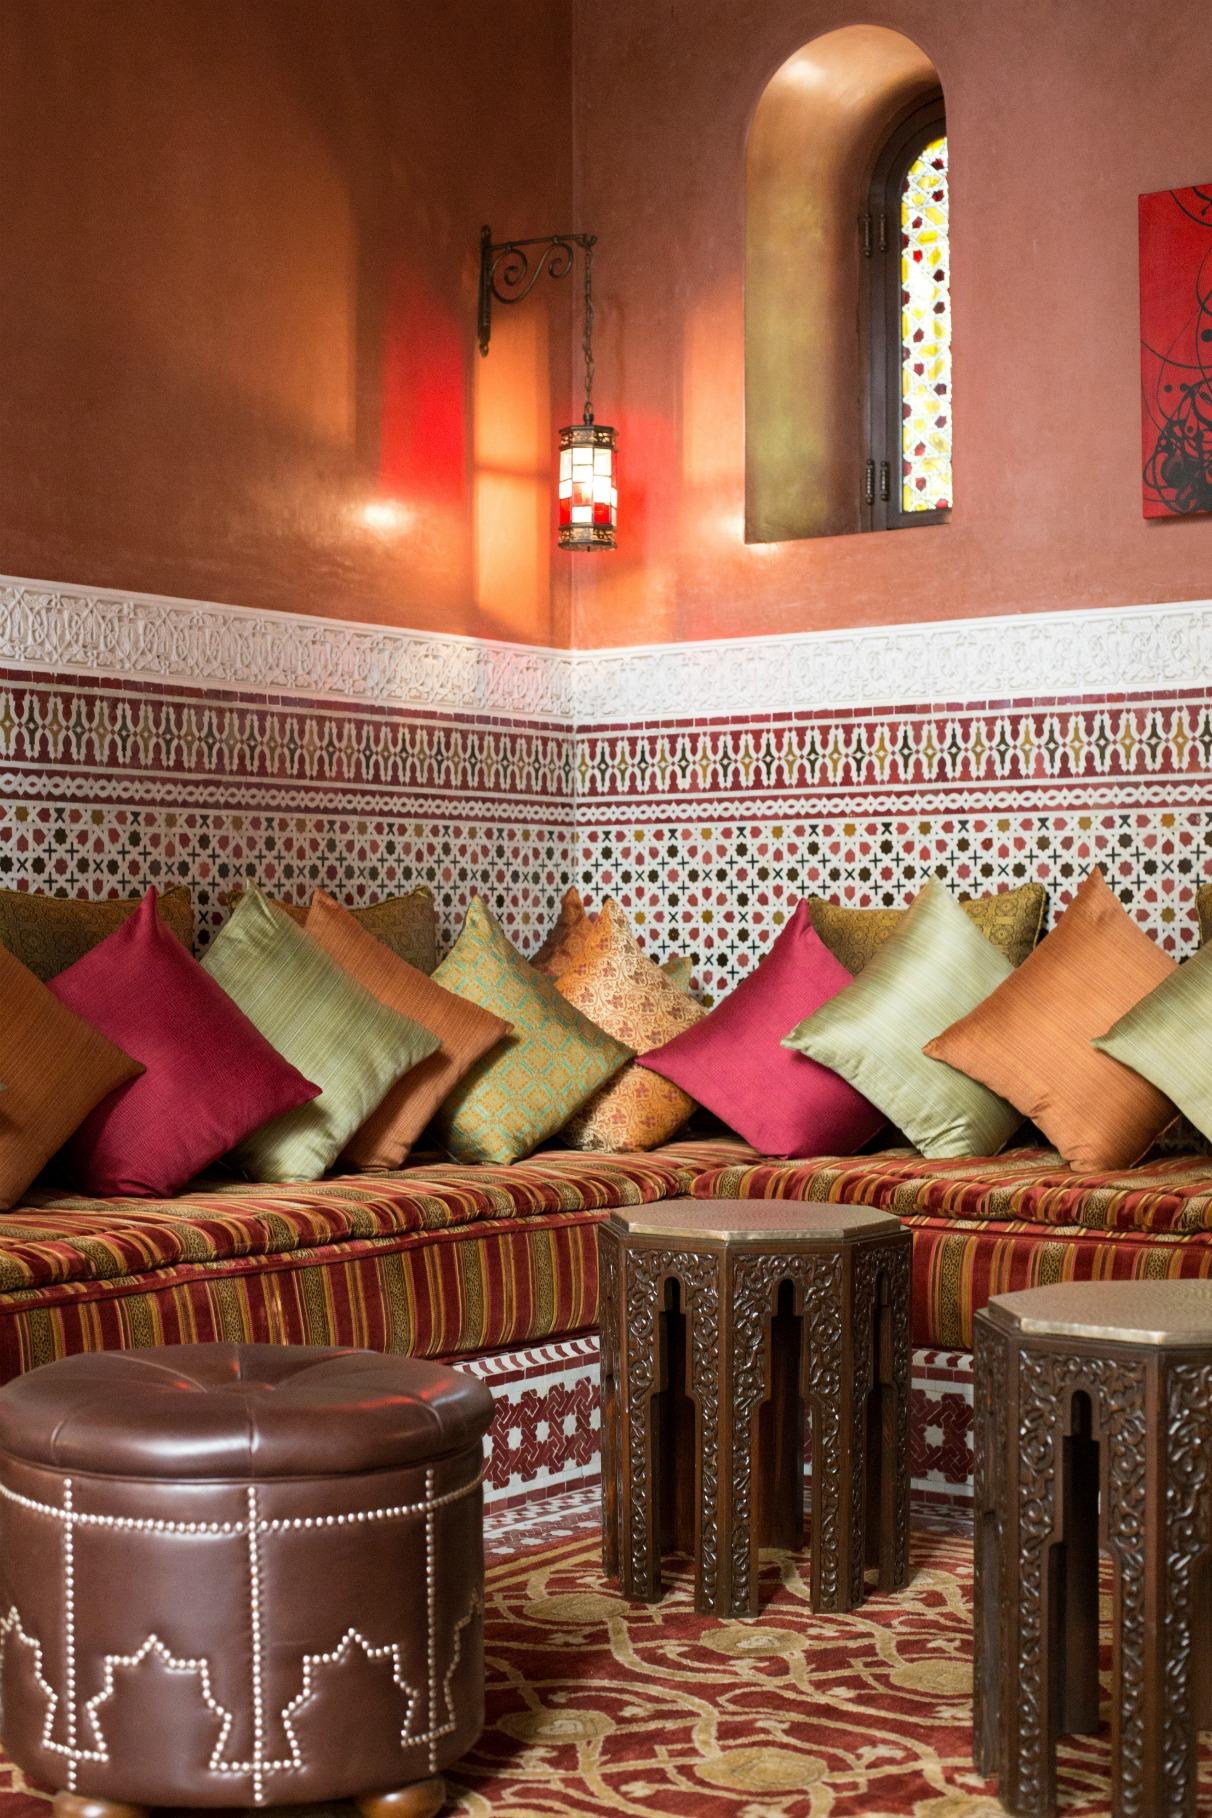 royal-mansour-hotel-luxury-marrakesch-marrakesh-morocco-edisa-shahini-disicouture-blog-27